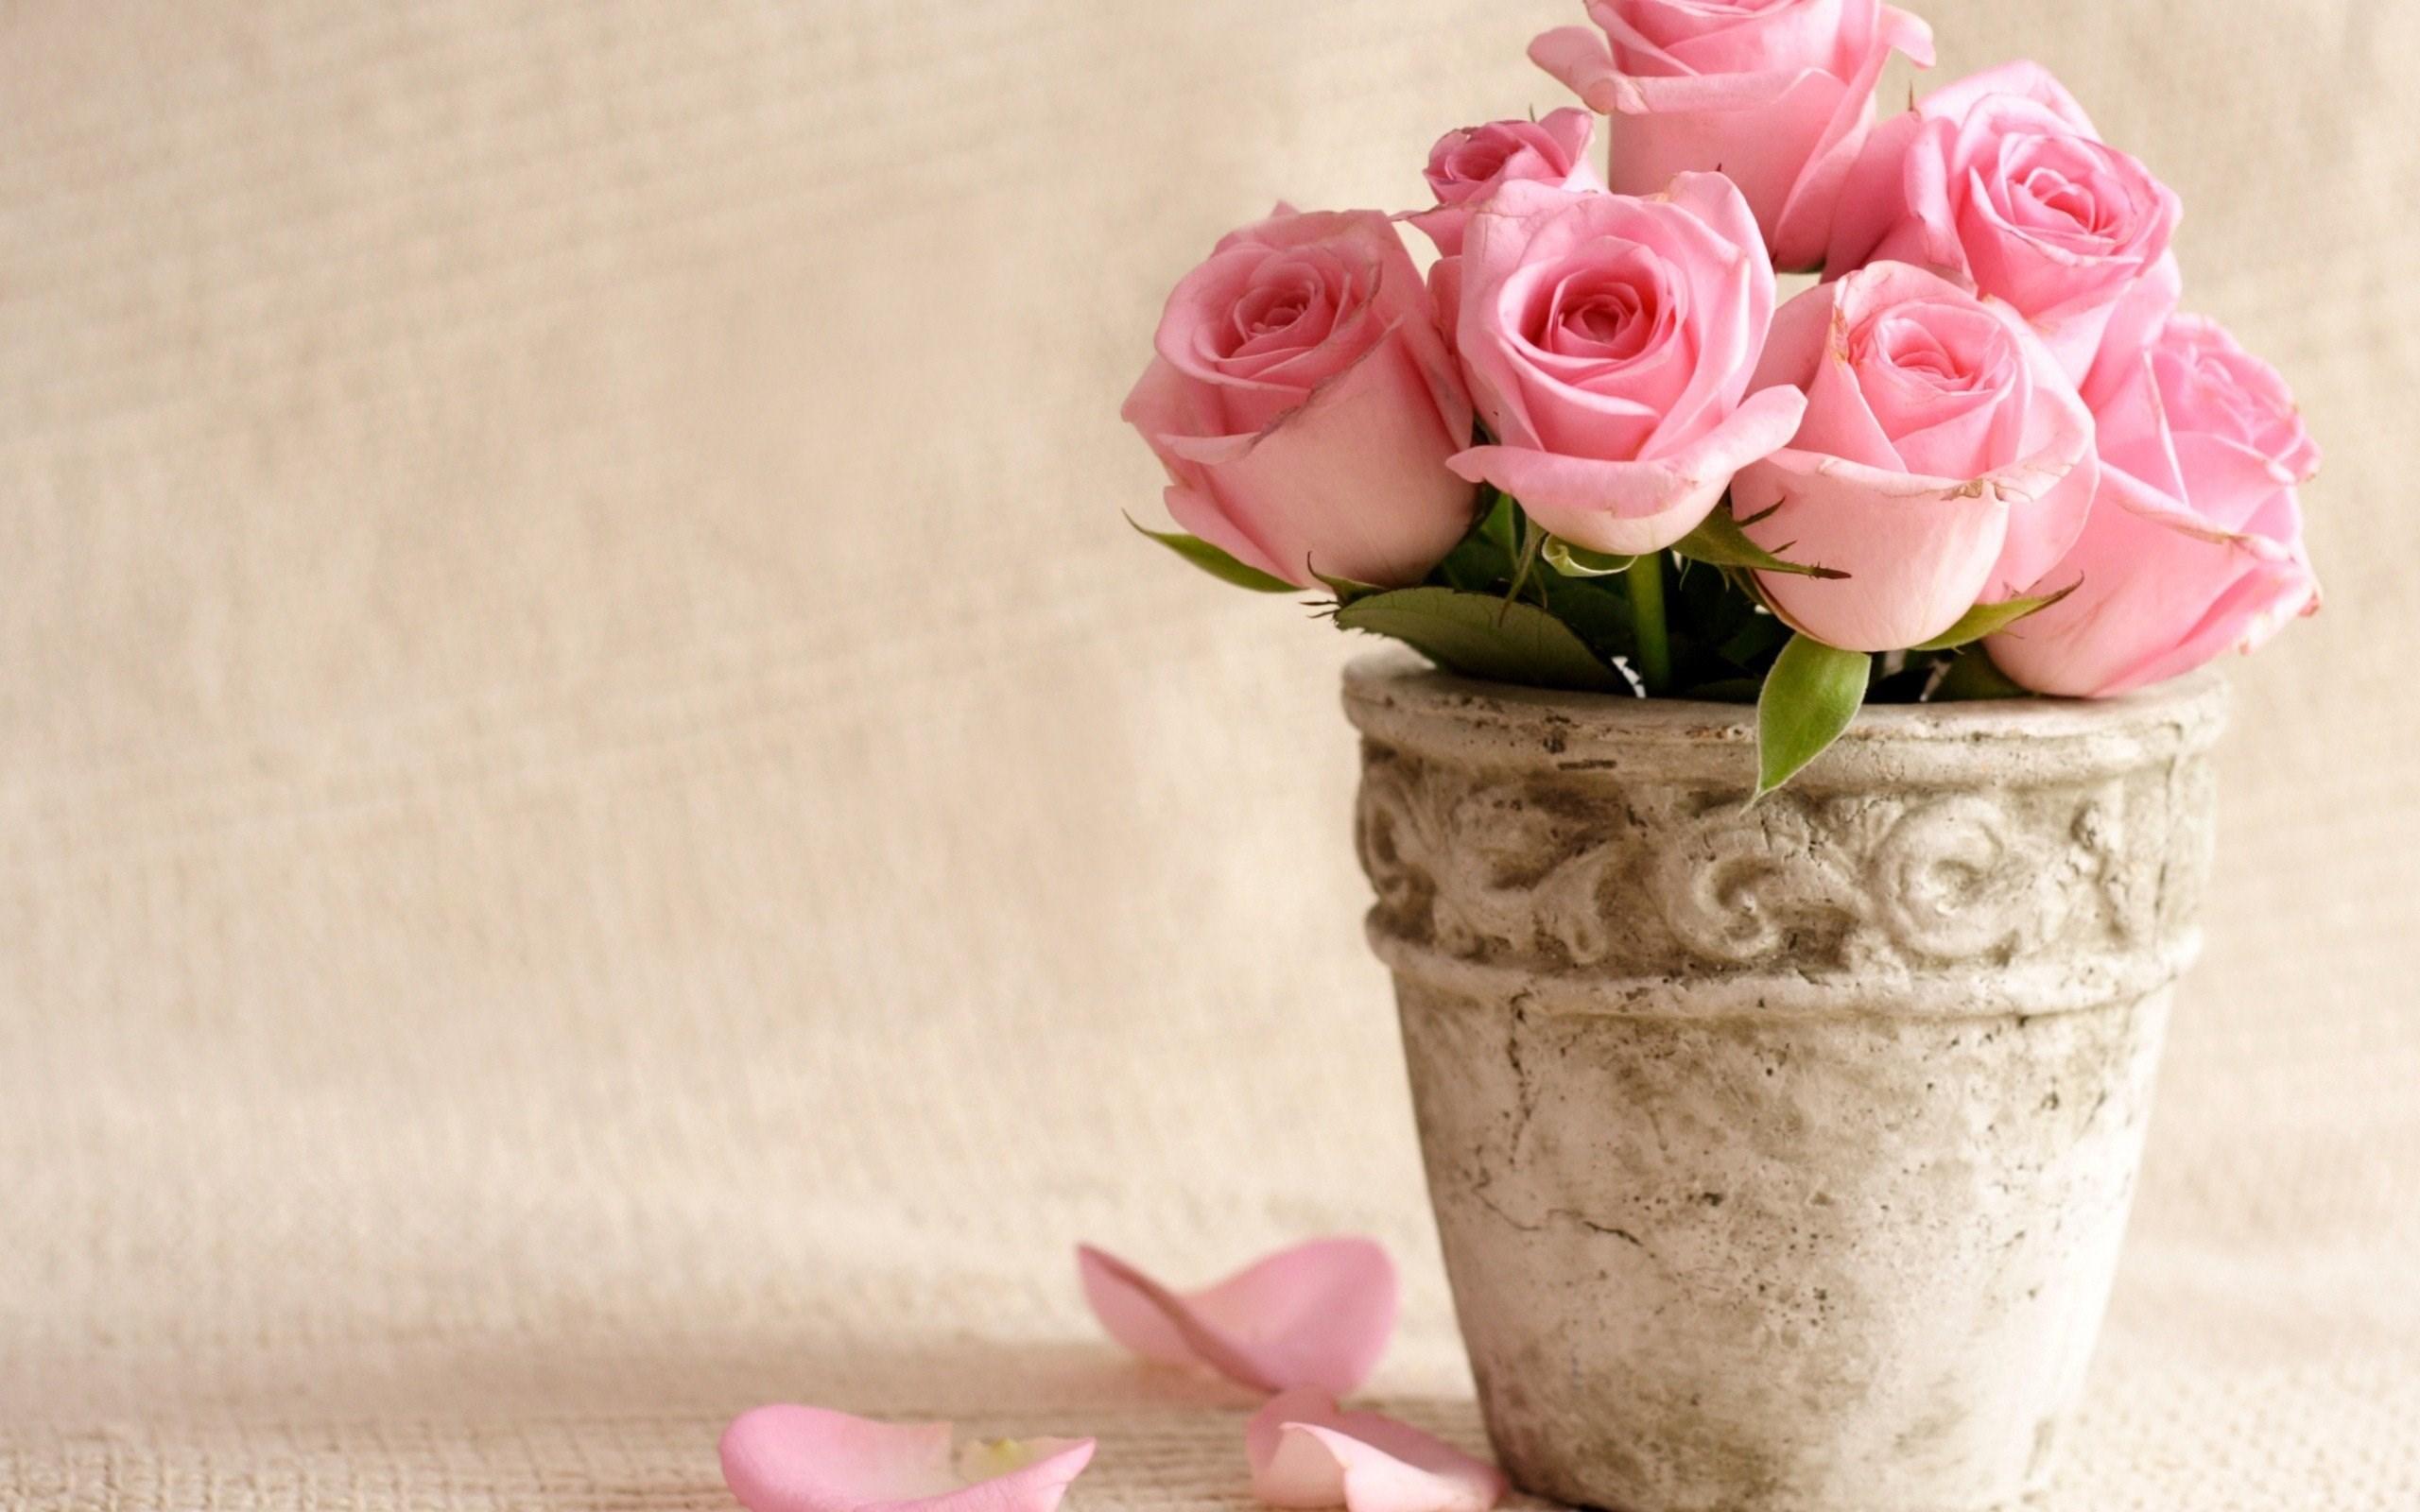 Flowers bucket roses vase pink roses wallpaper 2560x1600 2560 x flowers bucket roses vase pink roses wallpaper 2560x1600 2560 x 1600 mightylinksfo